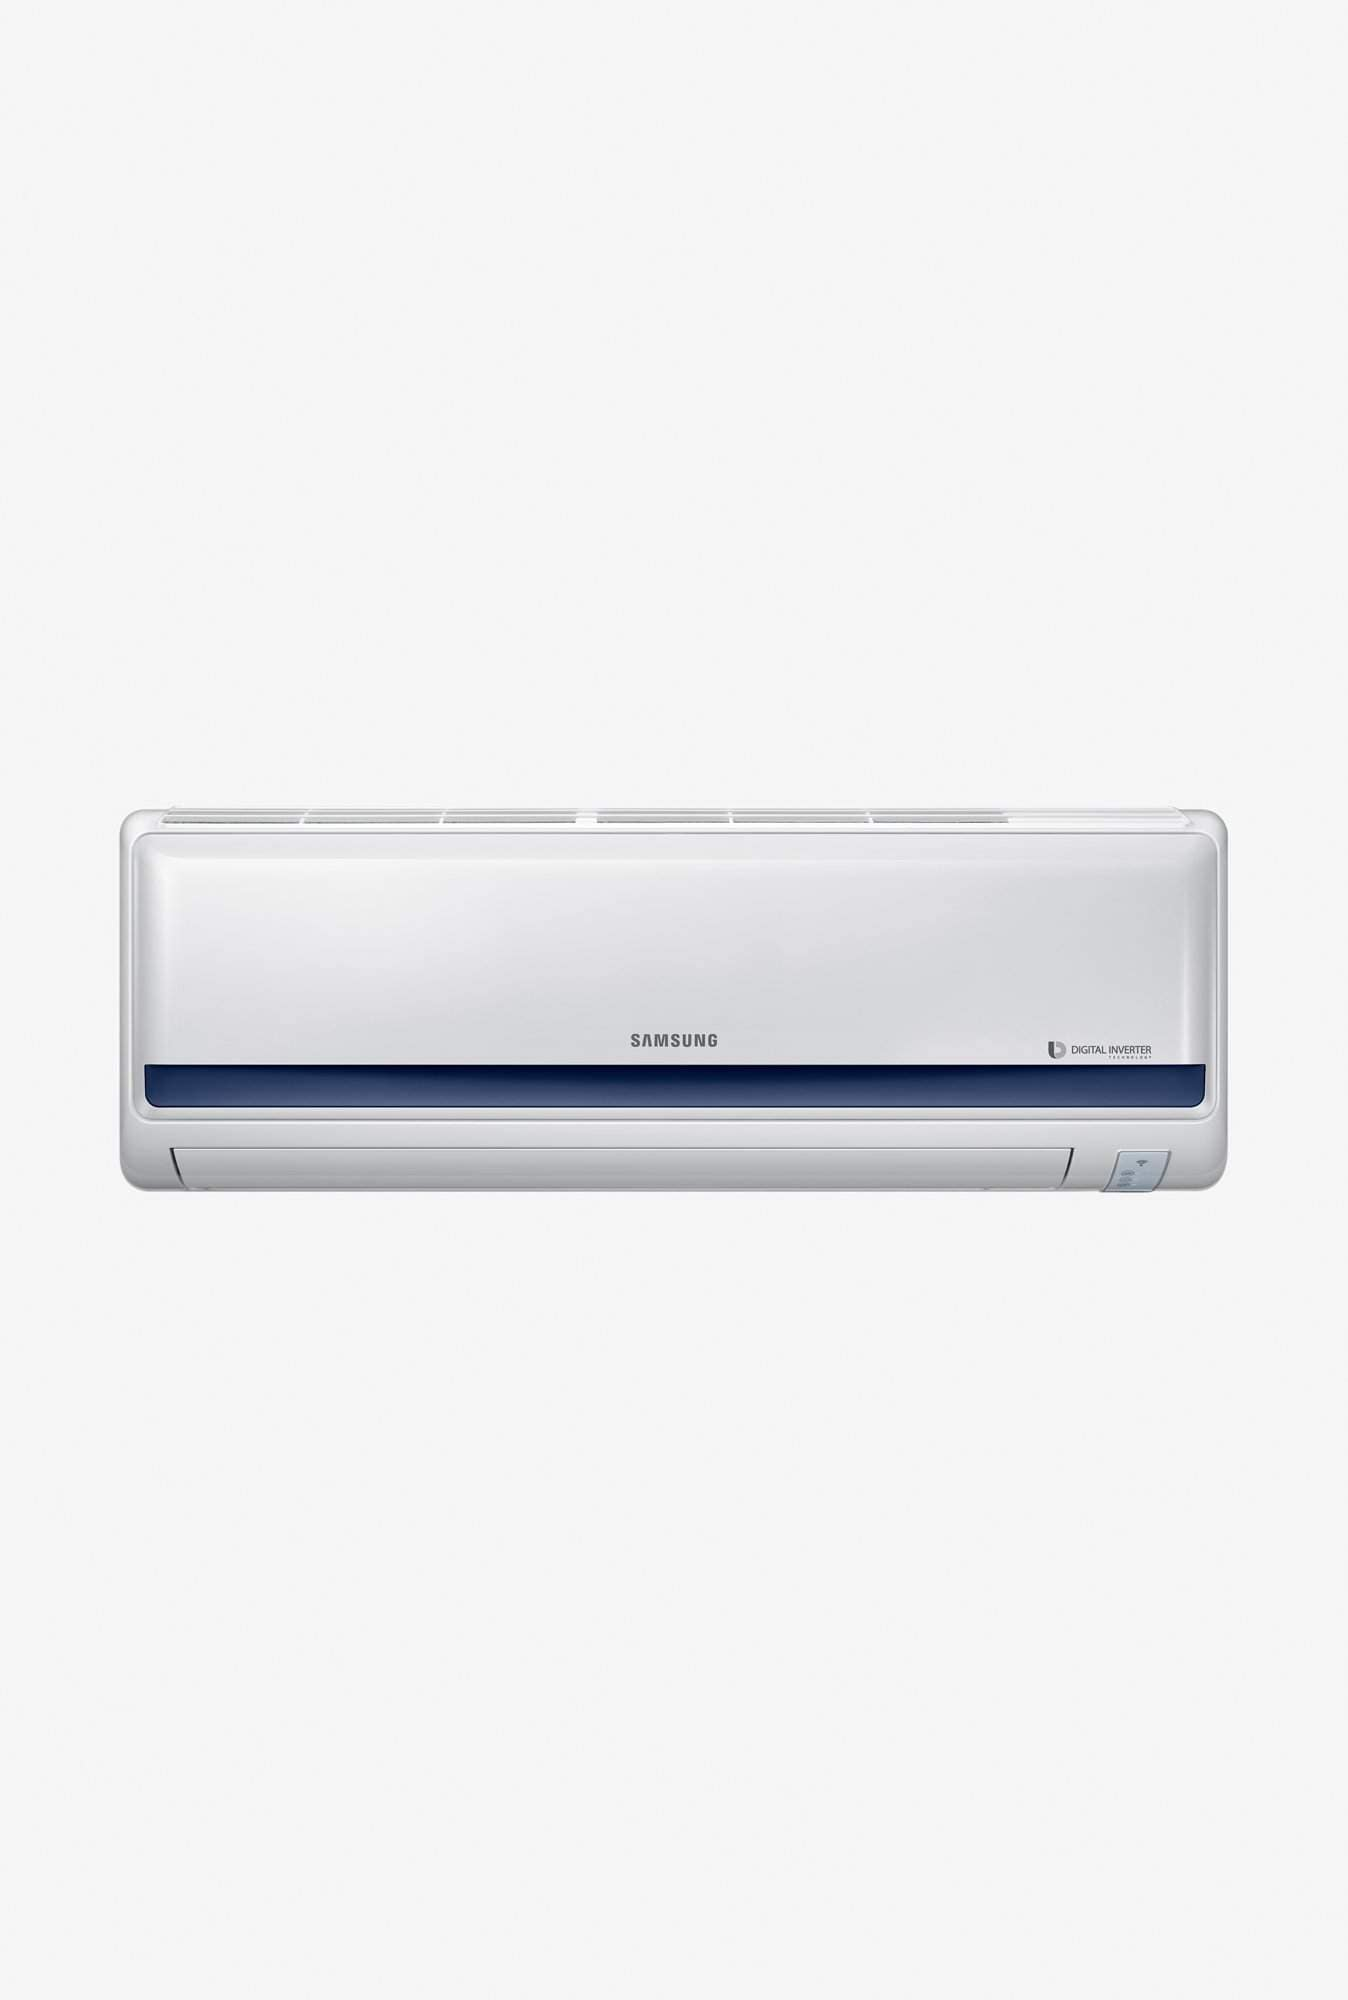 Samsung 1.0 Ton 3 Star (BEE Rating 2017) AR12MV3UFMCNNA Split AC (White)